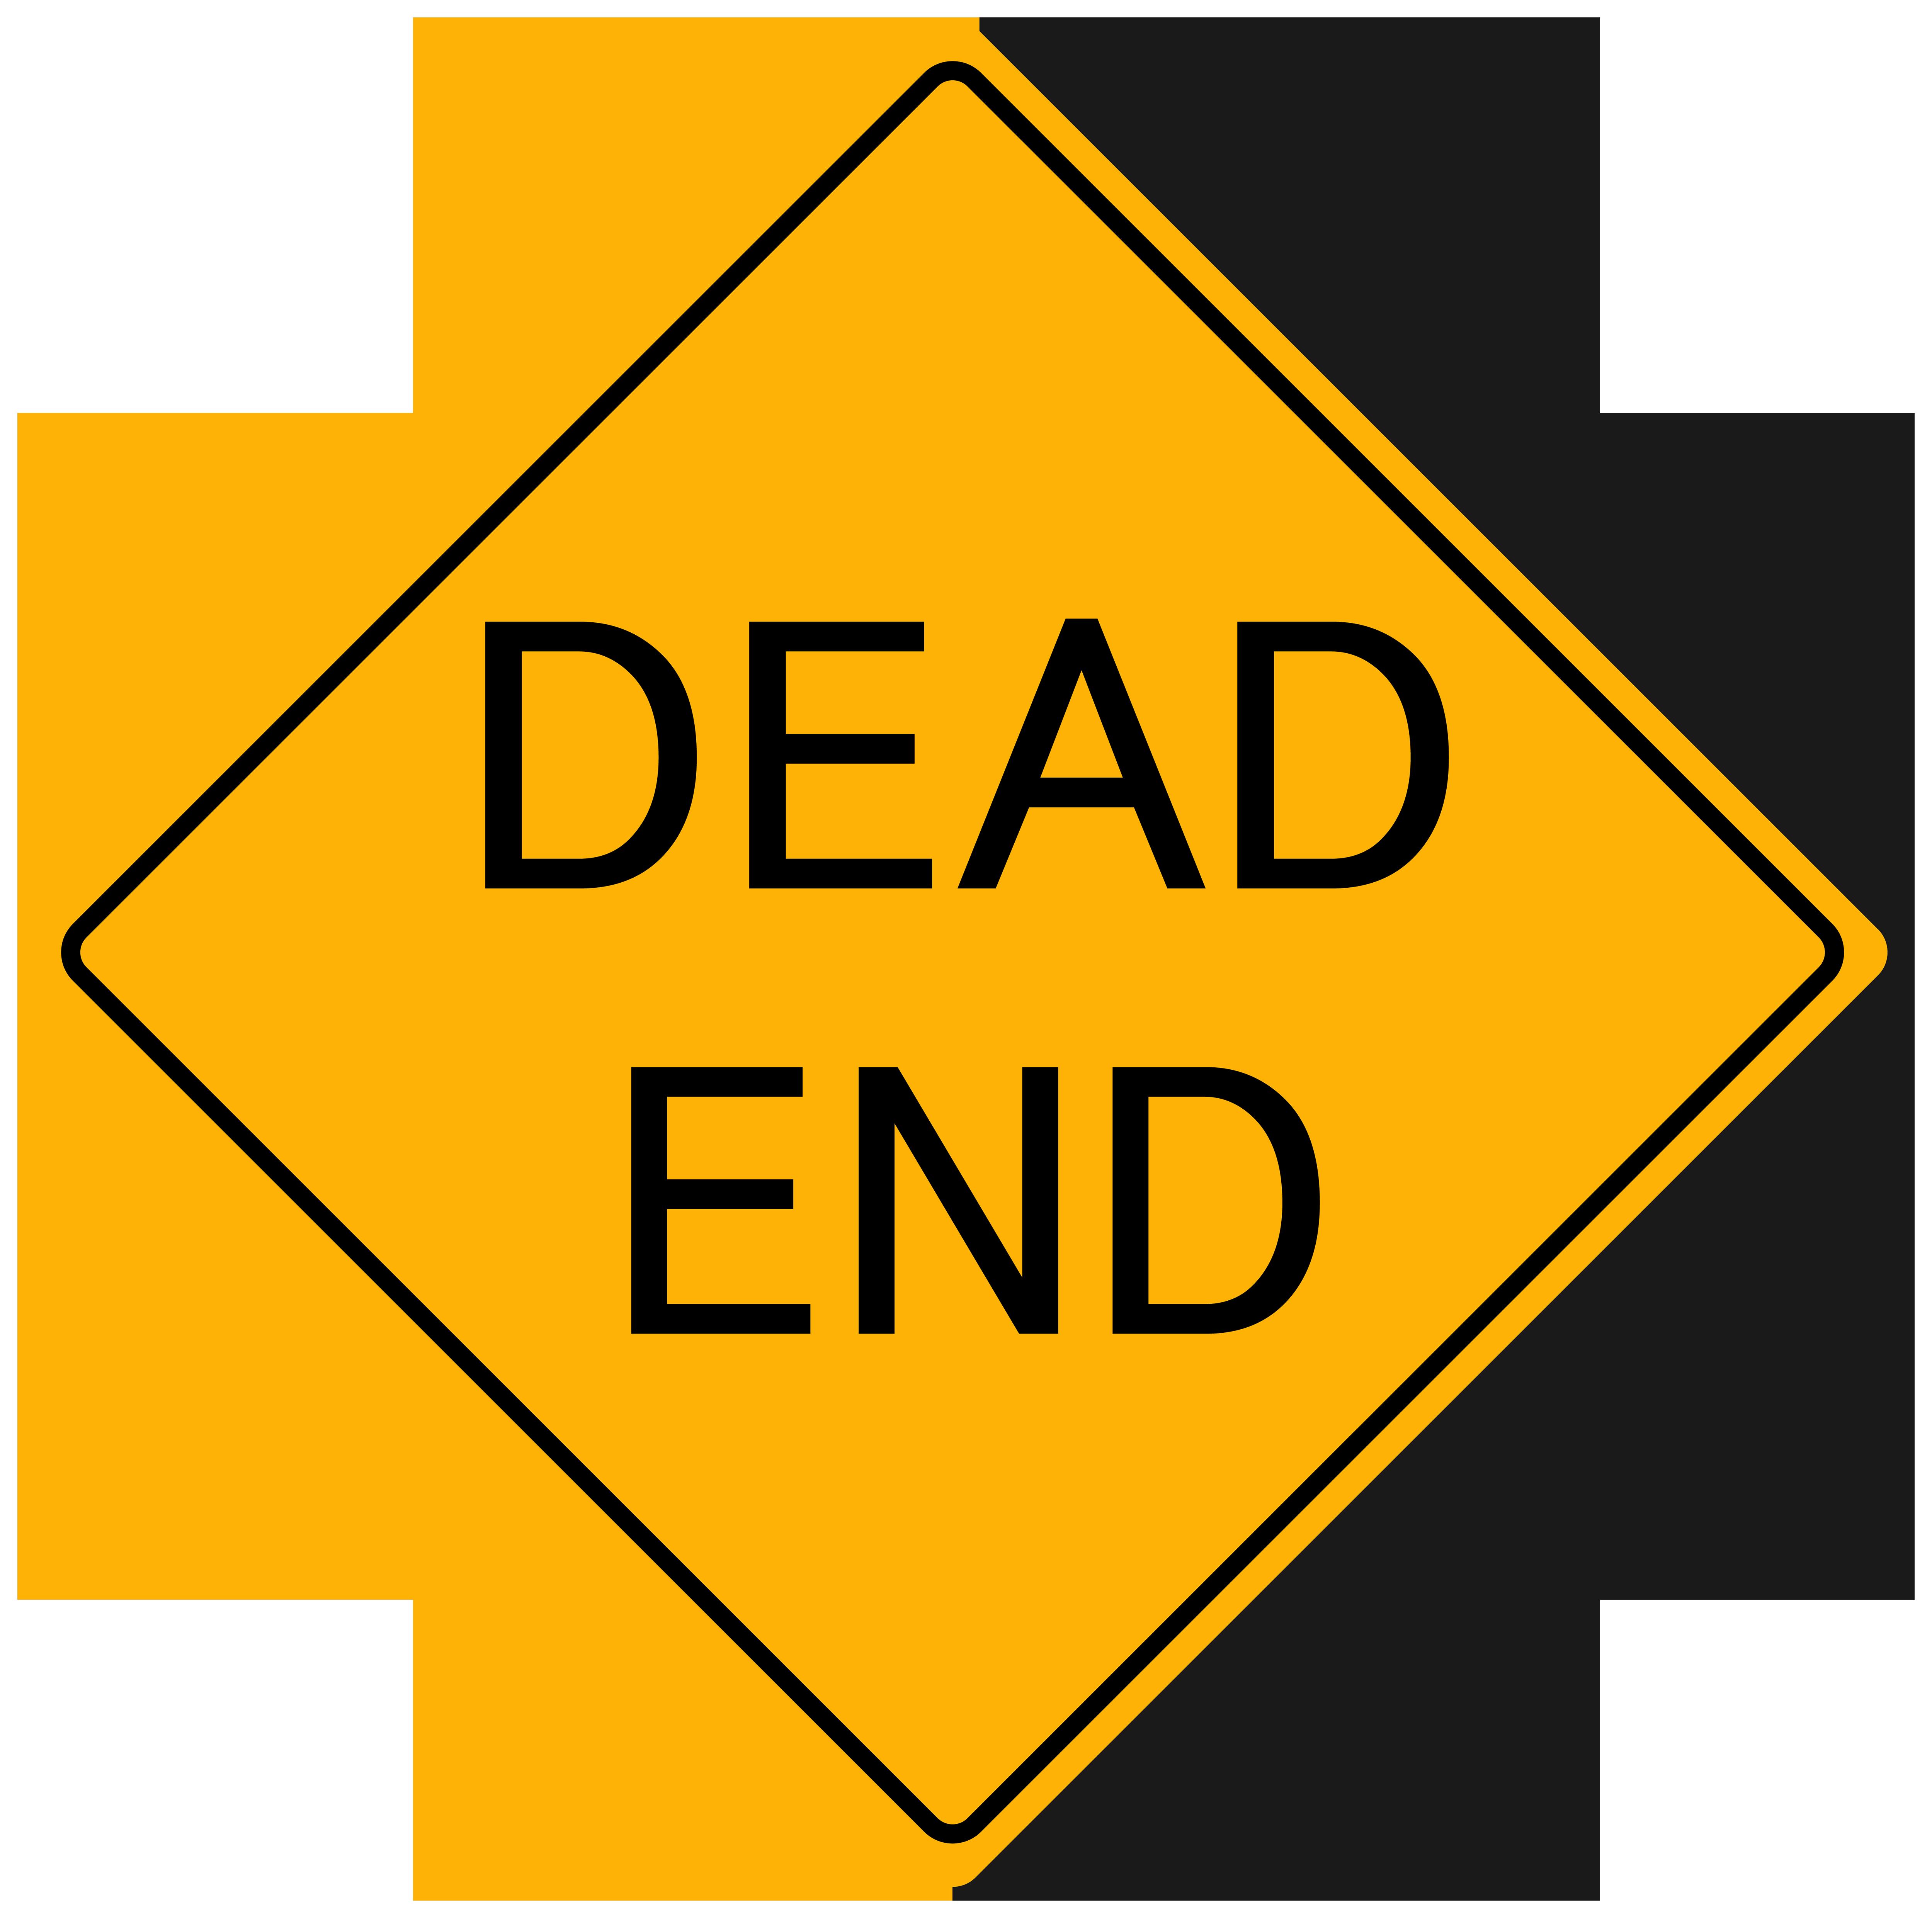 Dead dog clipart jpg royalty free Dead End Sign PNG Clipart - Best WEB Clipart jpg royalty free